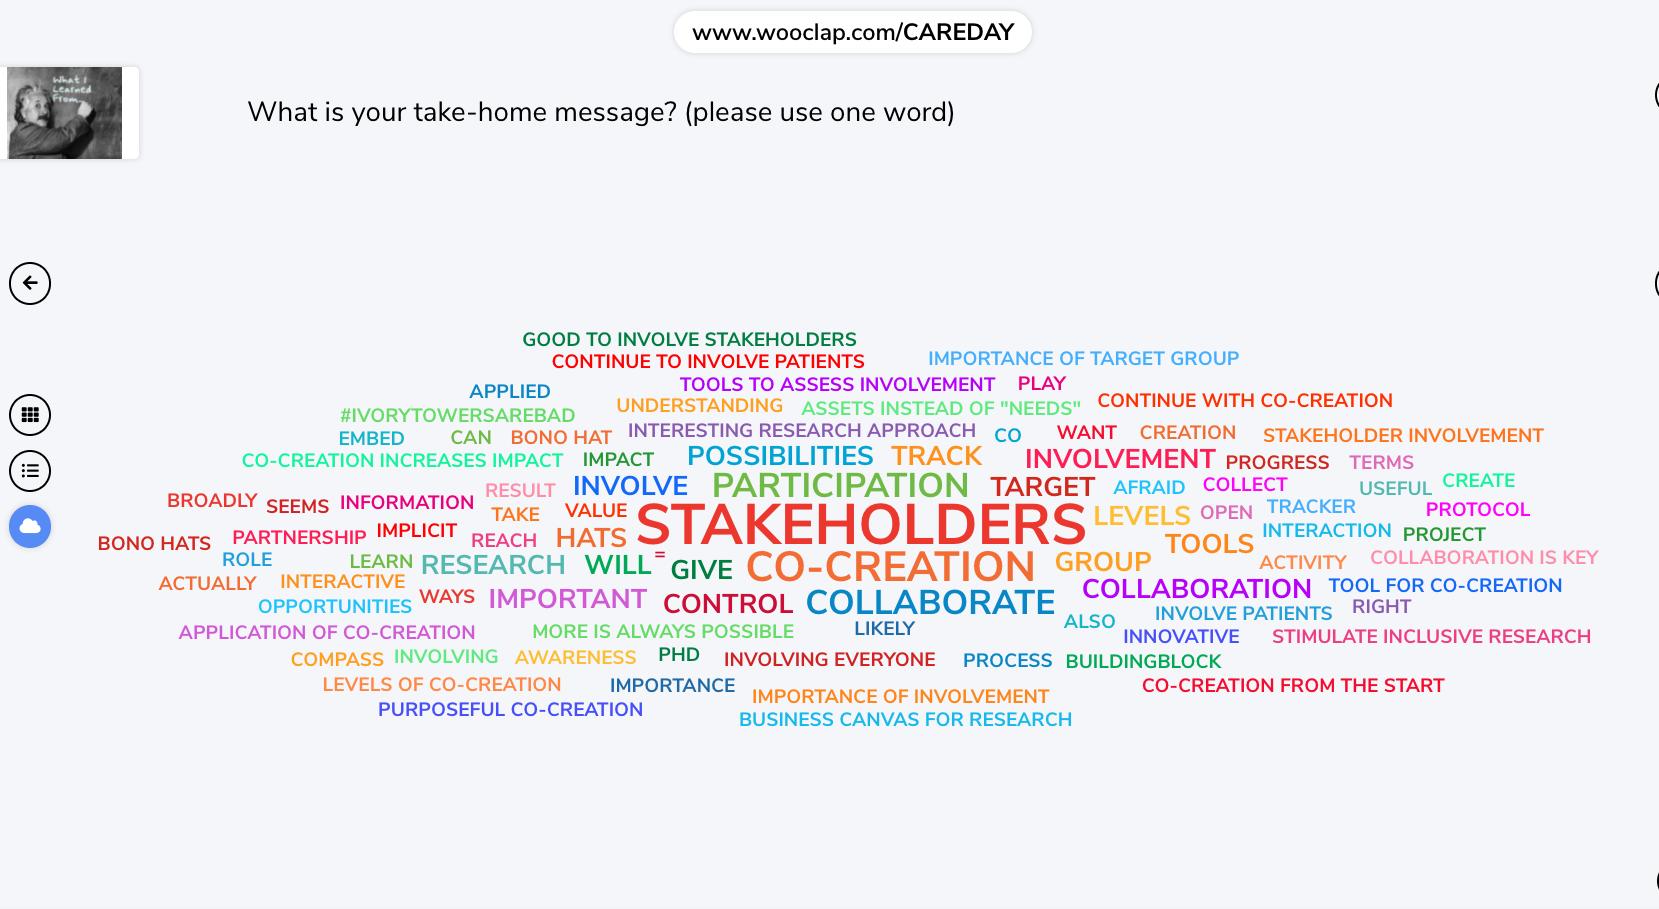 care-dag-take-home-message-2021-05-26-om-11.26.03